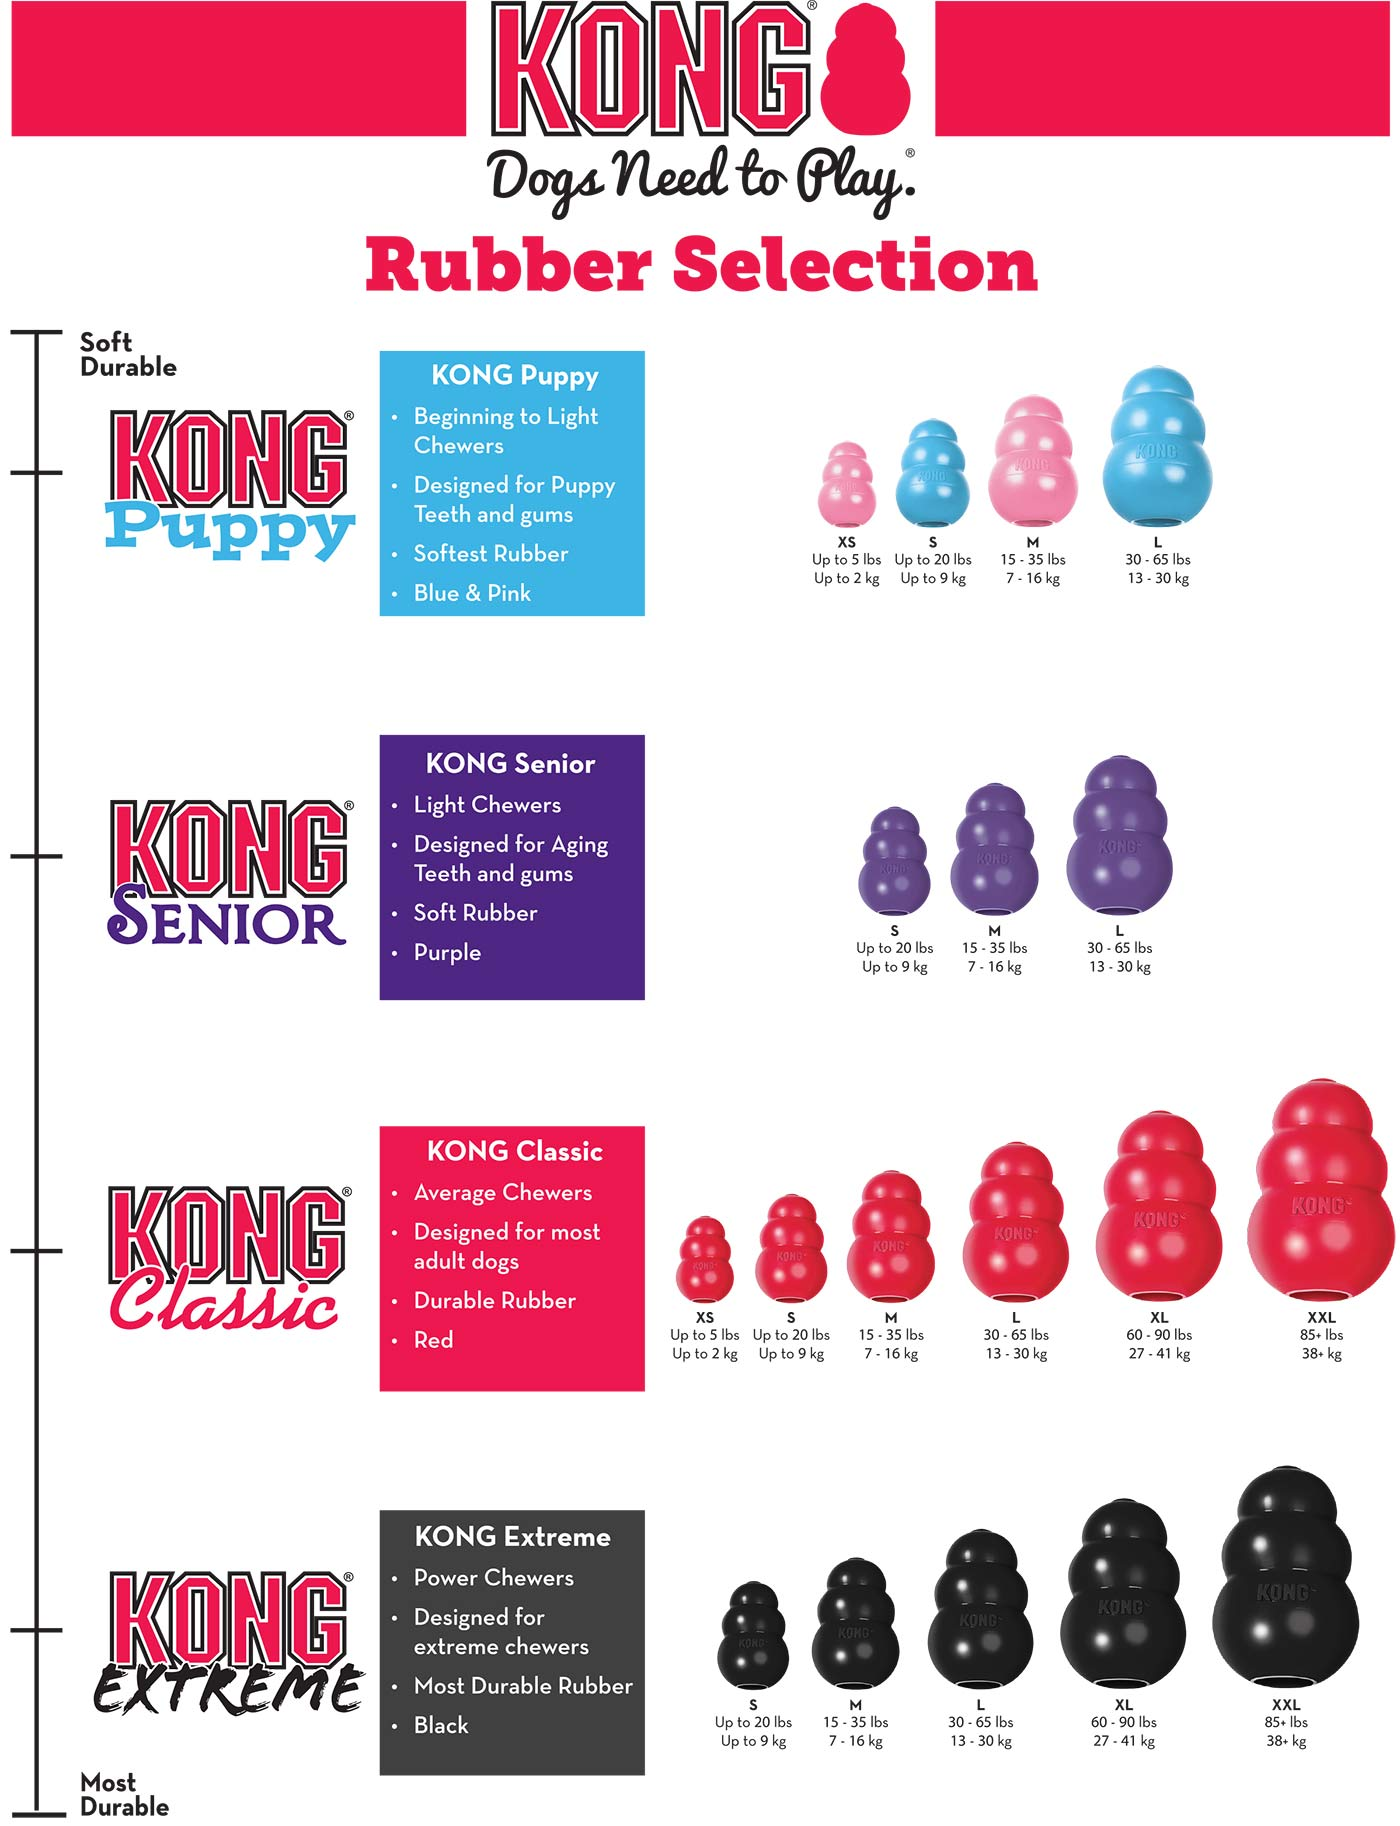 KONG rubber selection